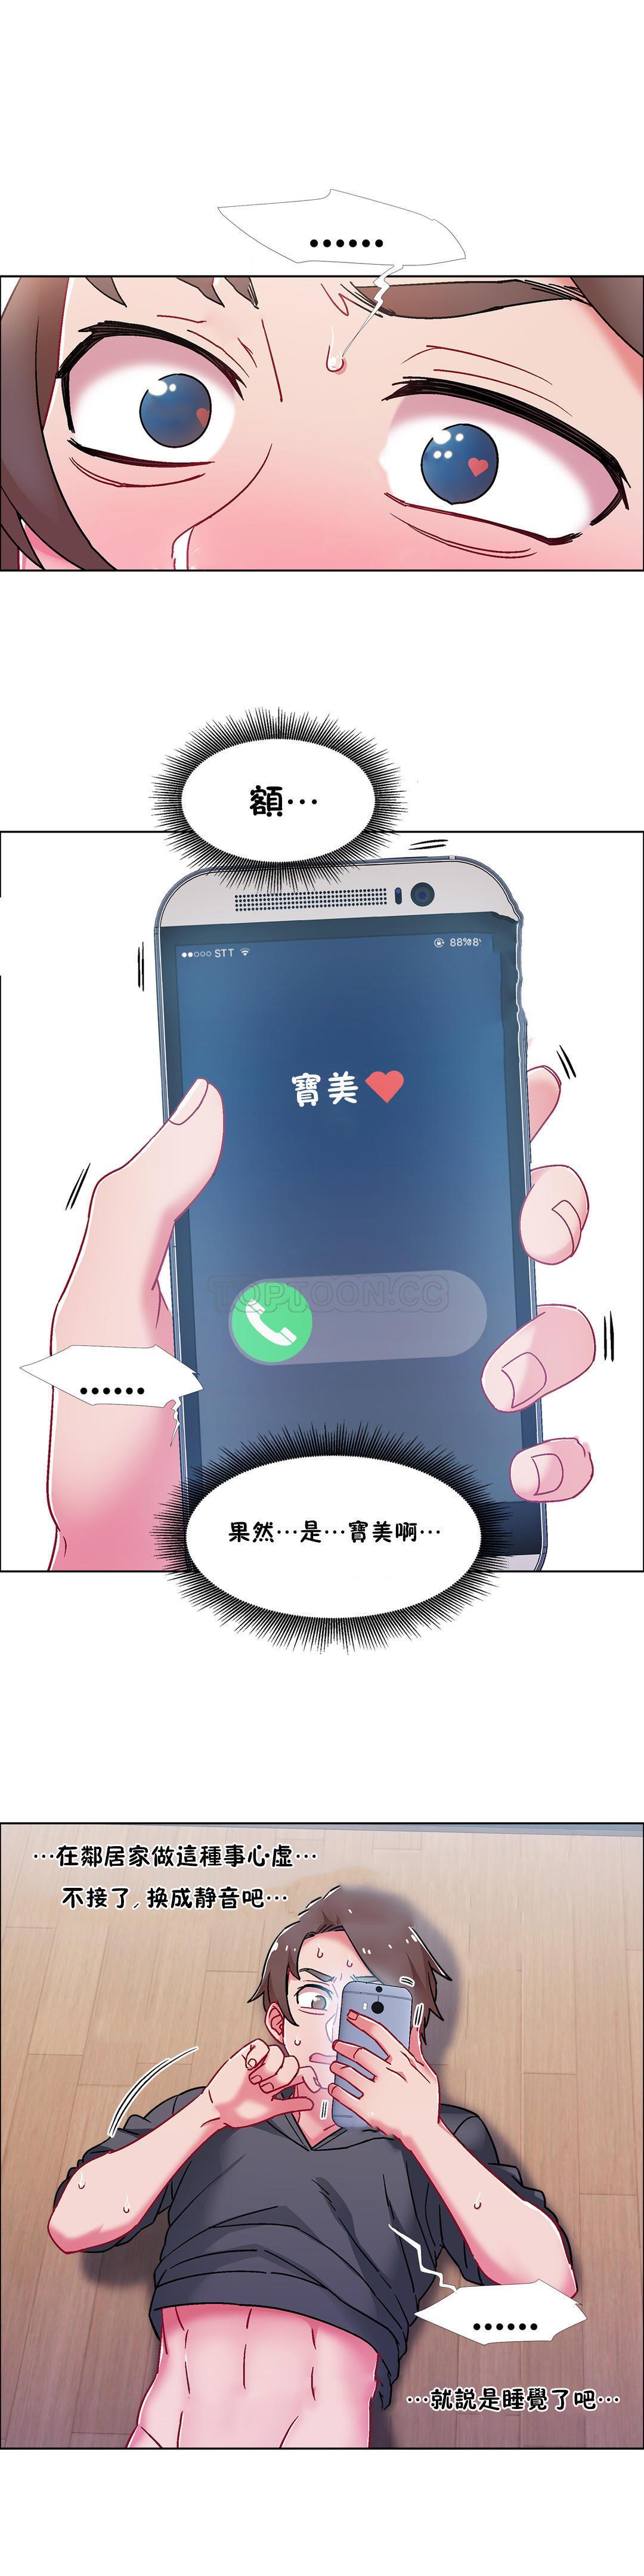 [Studio Wannabe] Rental Girls | 出租女郎 Ch. 33-58 [Chinese]  第二季 完结 386